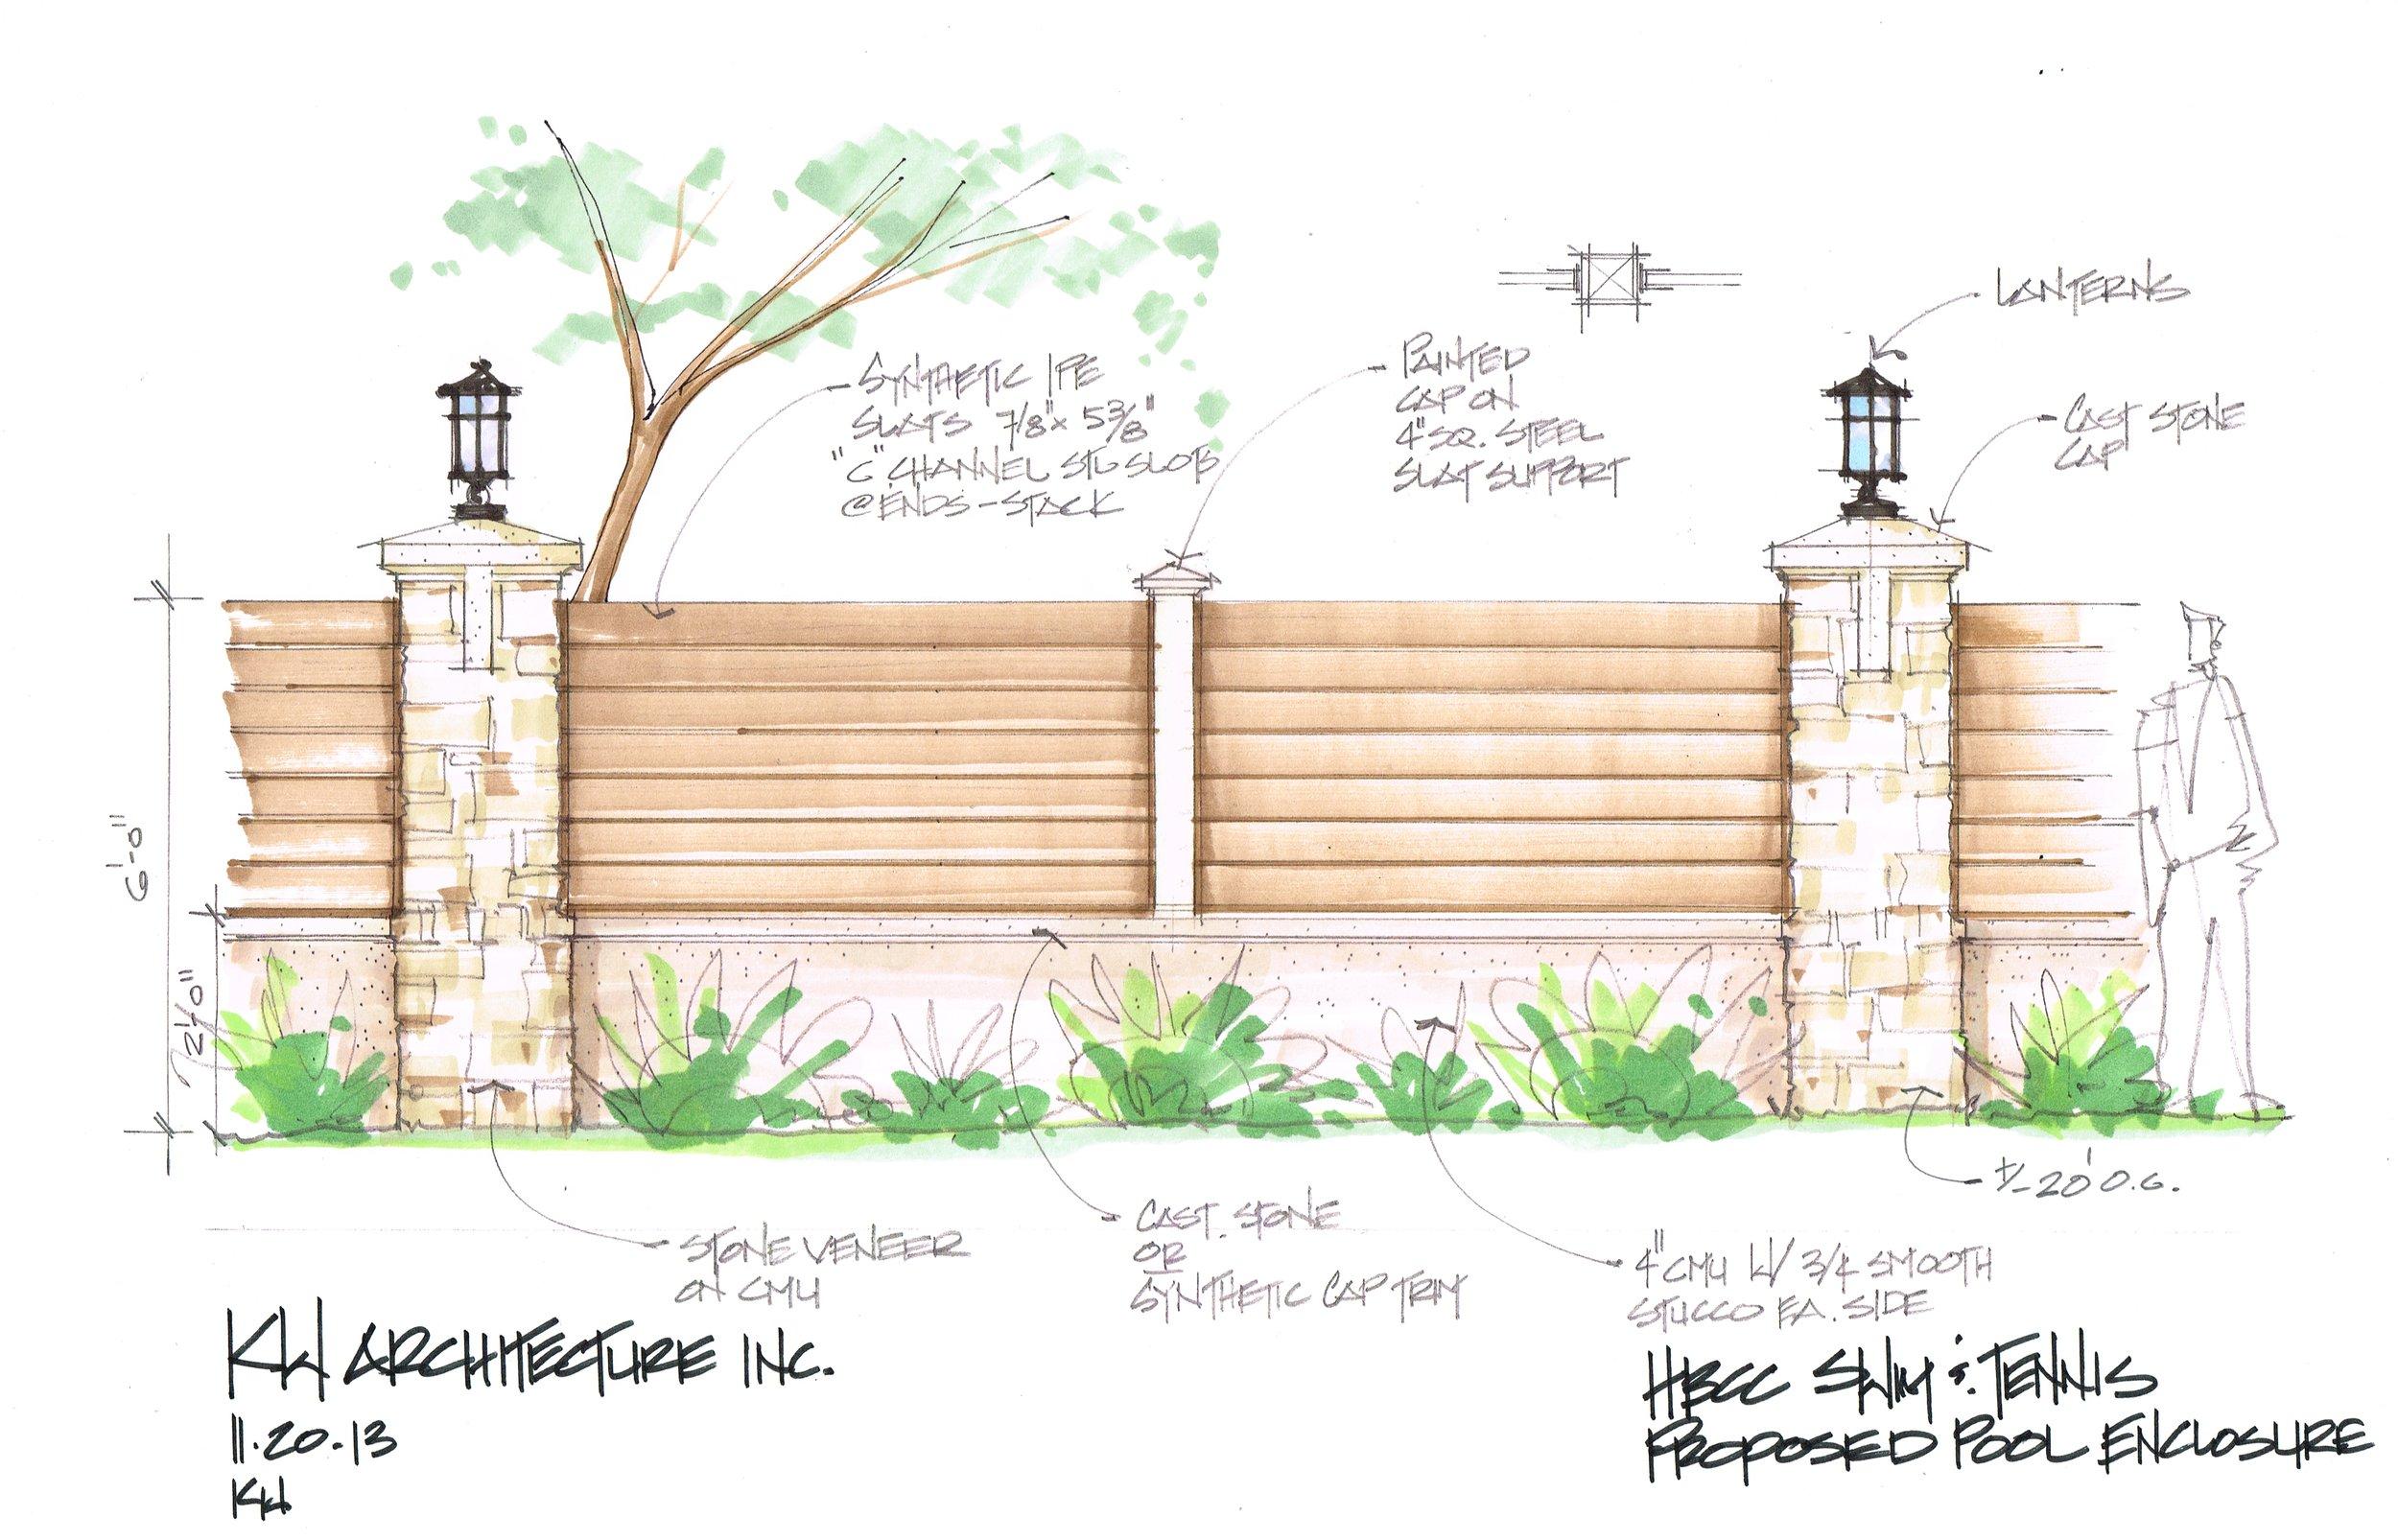 Stone and Slat Wall Design 11-20-13.jpg